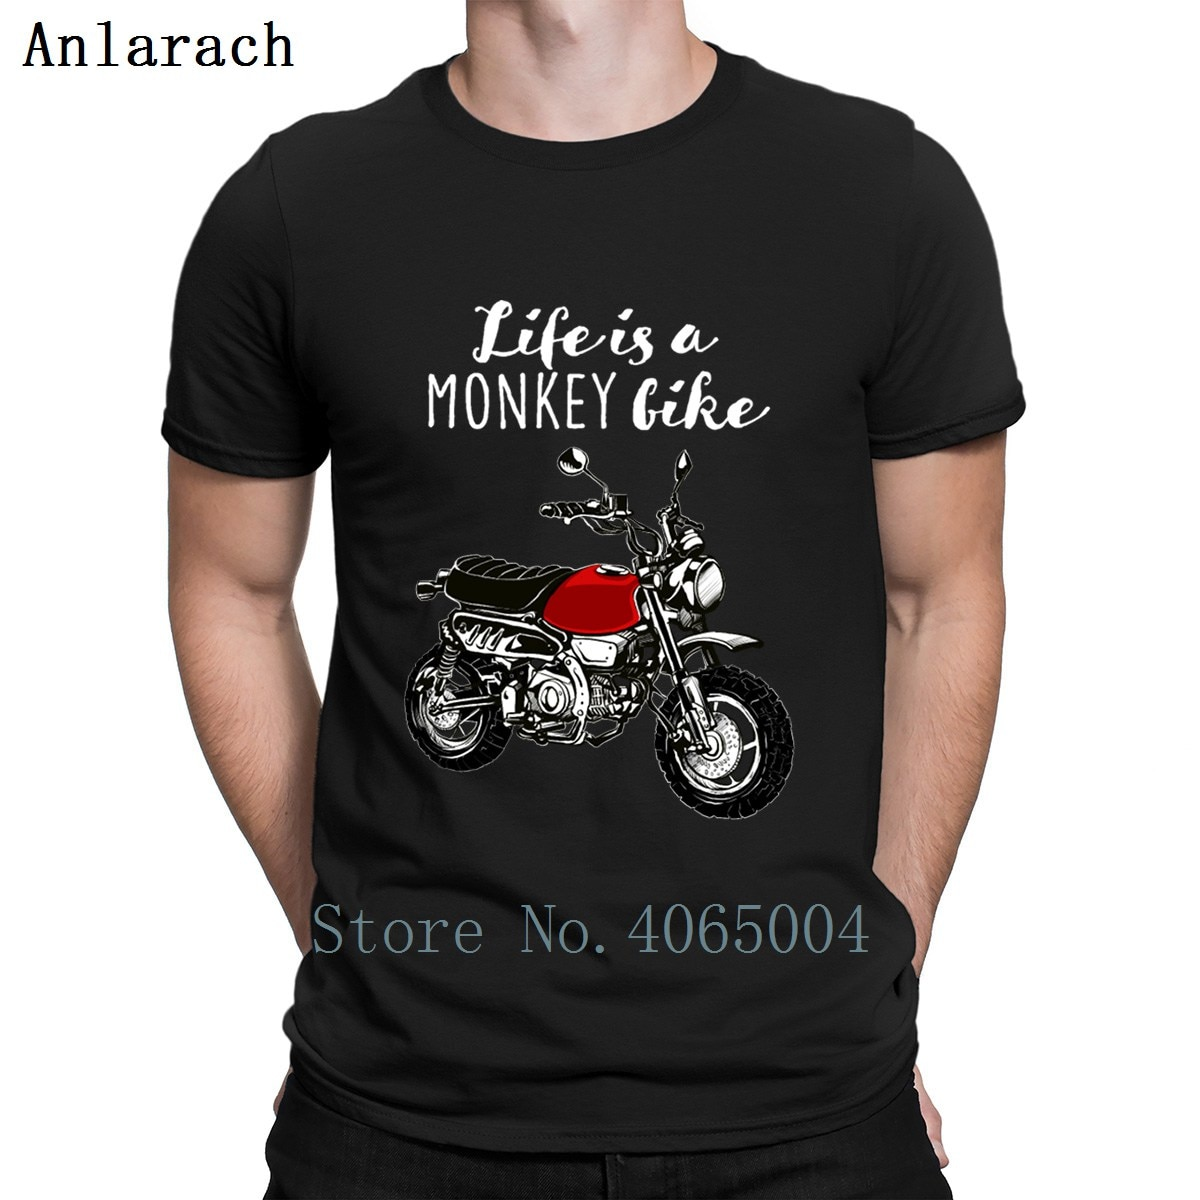 Life Is A Monkey Bike Motorcycle T Shirt Building Designer Cotton Plus Size 3xl Streetwear Unique Interesting Summer Style Shirt